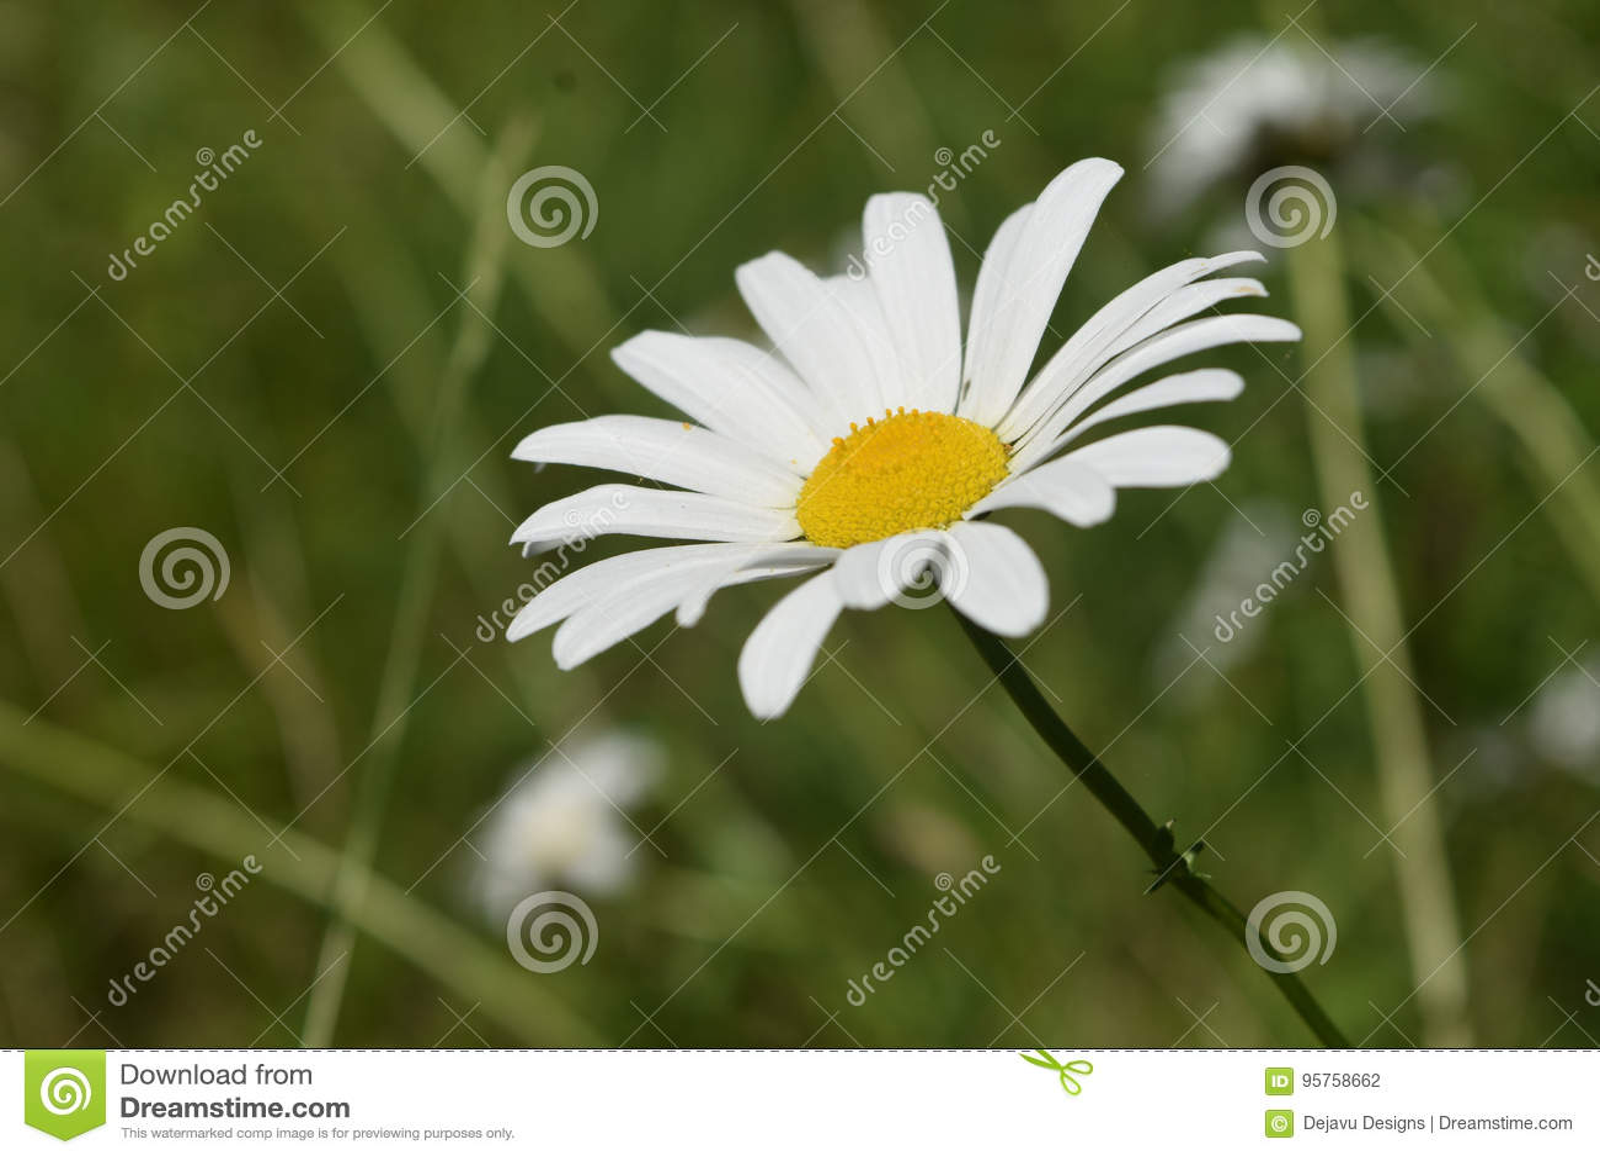 Perfecte Witte en Gele Daisy Flowering op een Gebied